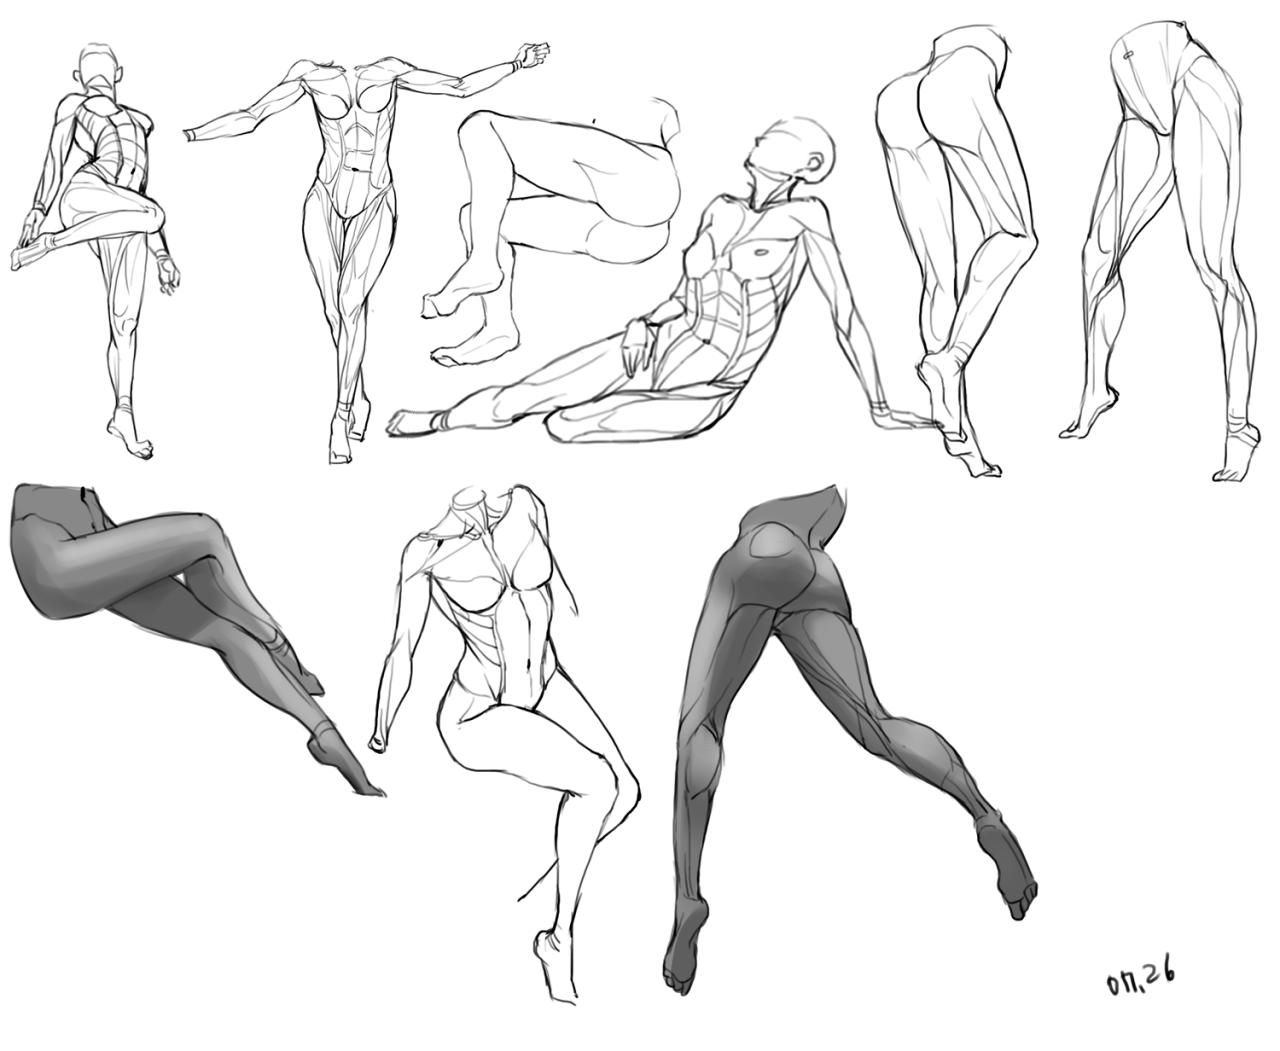 4 Tumblr Anatomy Life Drawing Pinterest Life Drawing